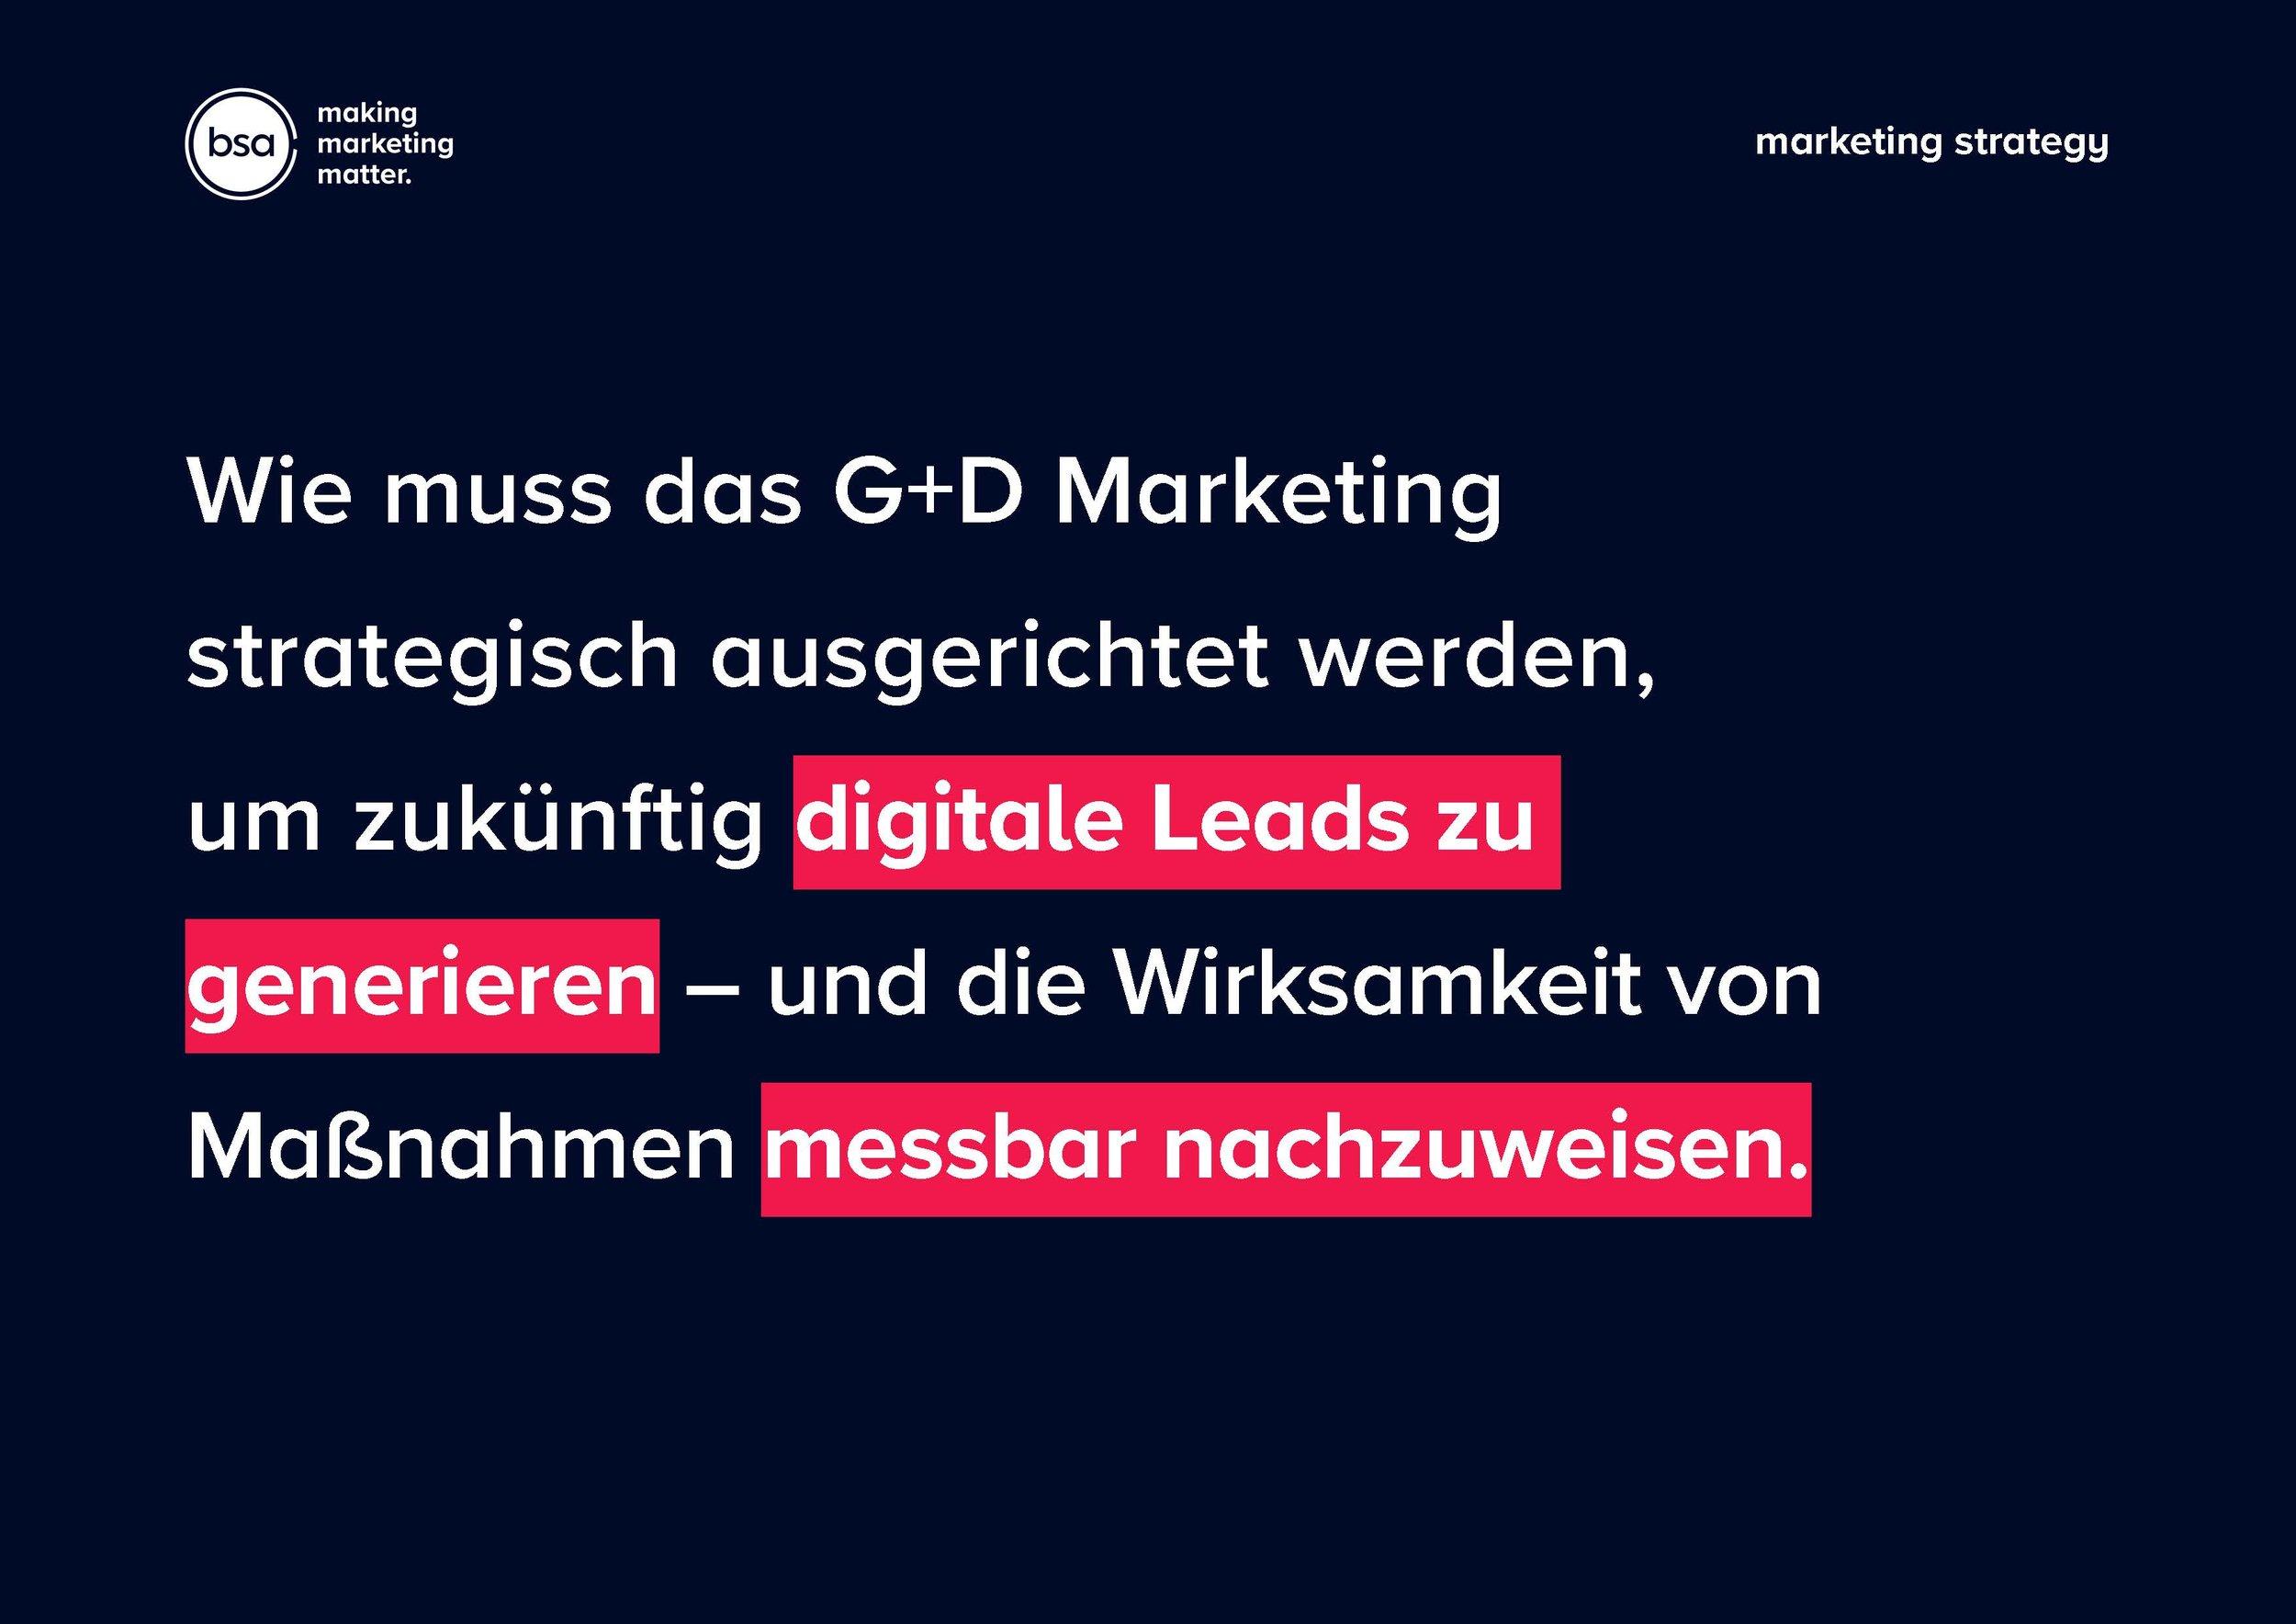 BSA_Case_marketingstrategy_190807_ohneZitat_Seite_03.jpg